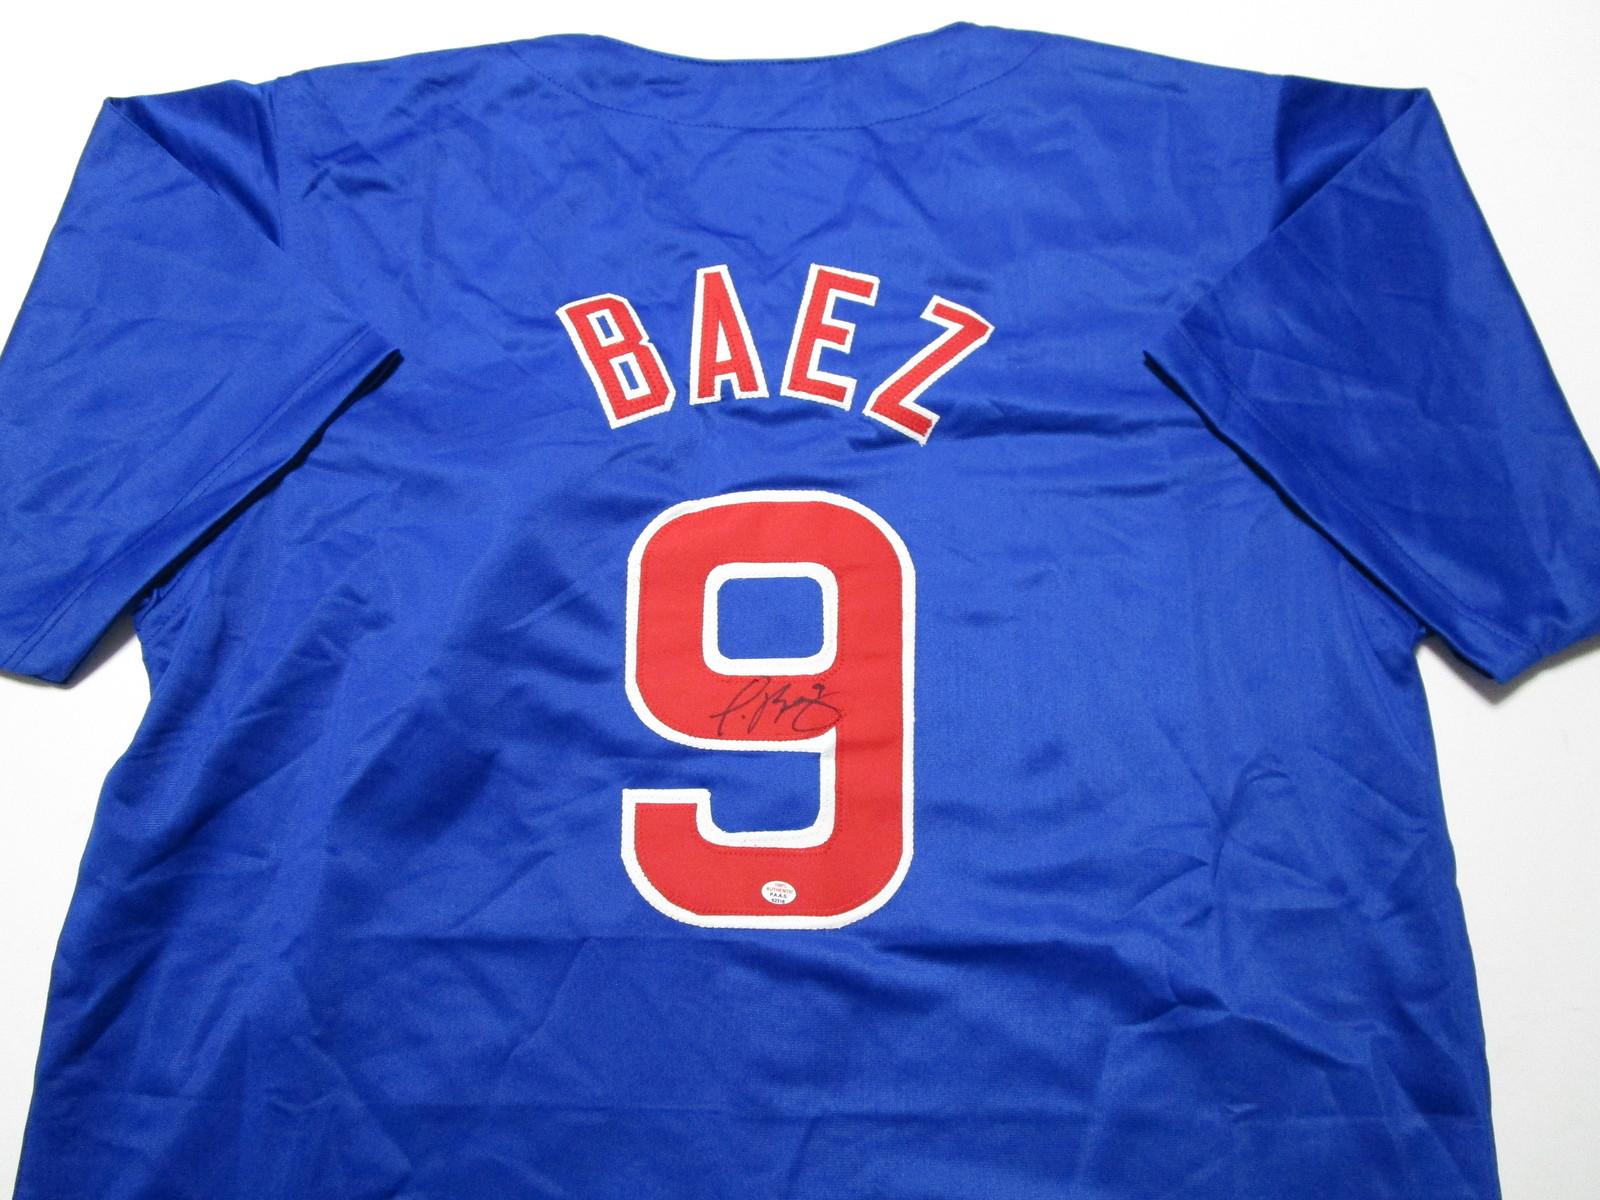 JAVIER BAEZ / AUTOGRAPHED CHICAGO CUBS BLUE CUSTOM BASEBALL JERSEY / COA